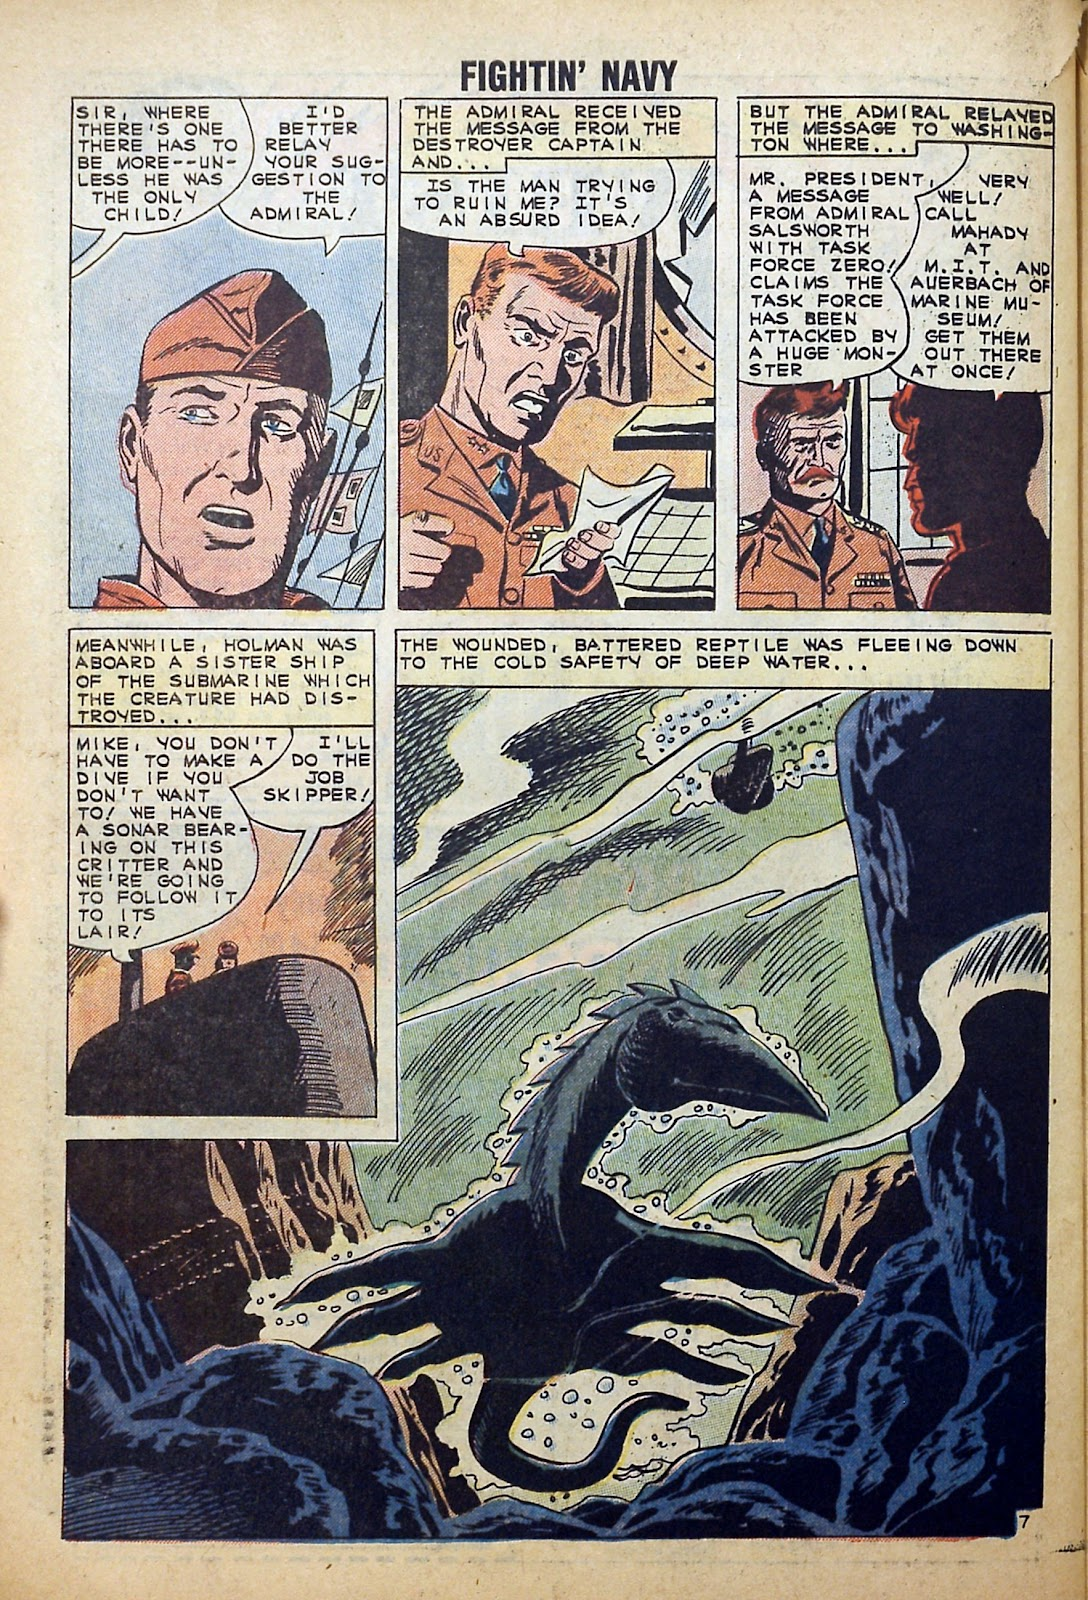 Read online Fightin' Navy comic -  Issue #99 - 32